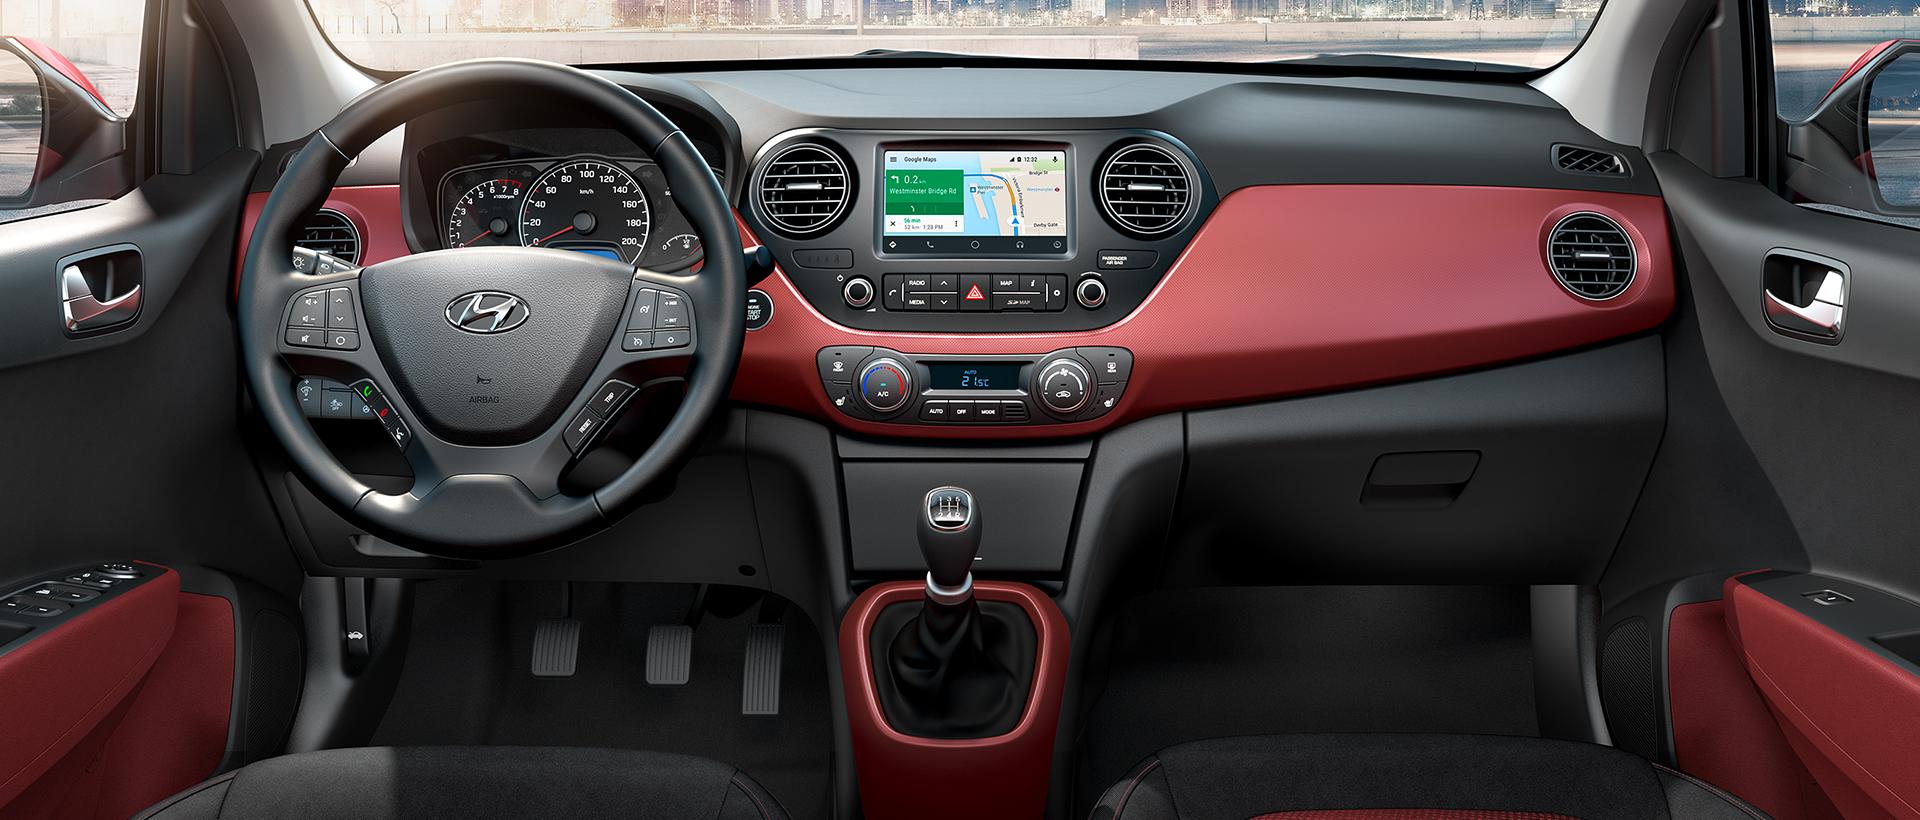 Hyundai i30 Fastback unutrašnjost